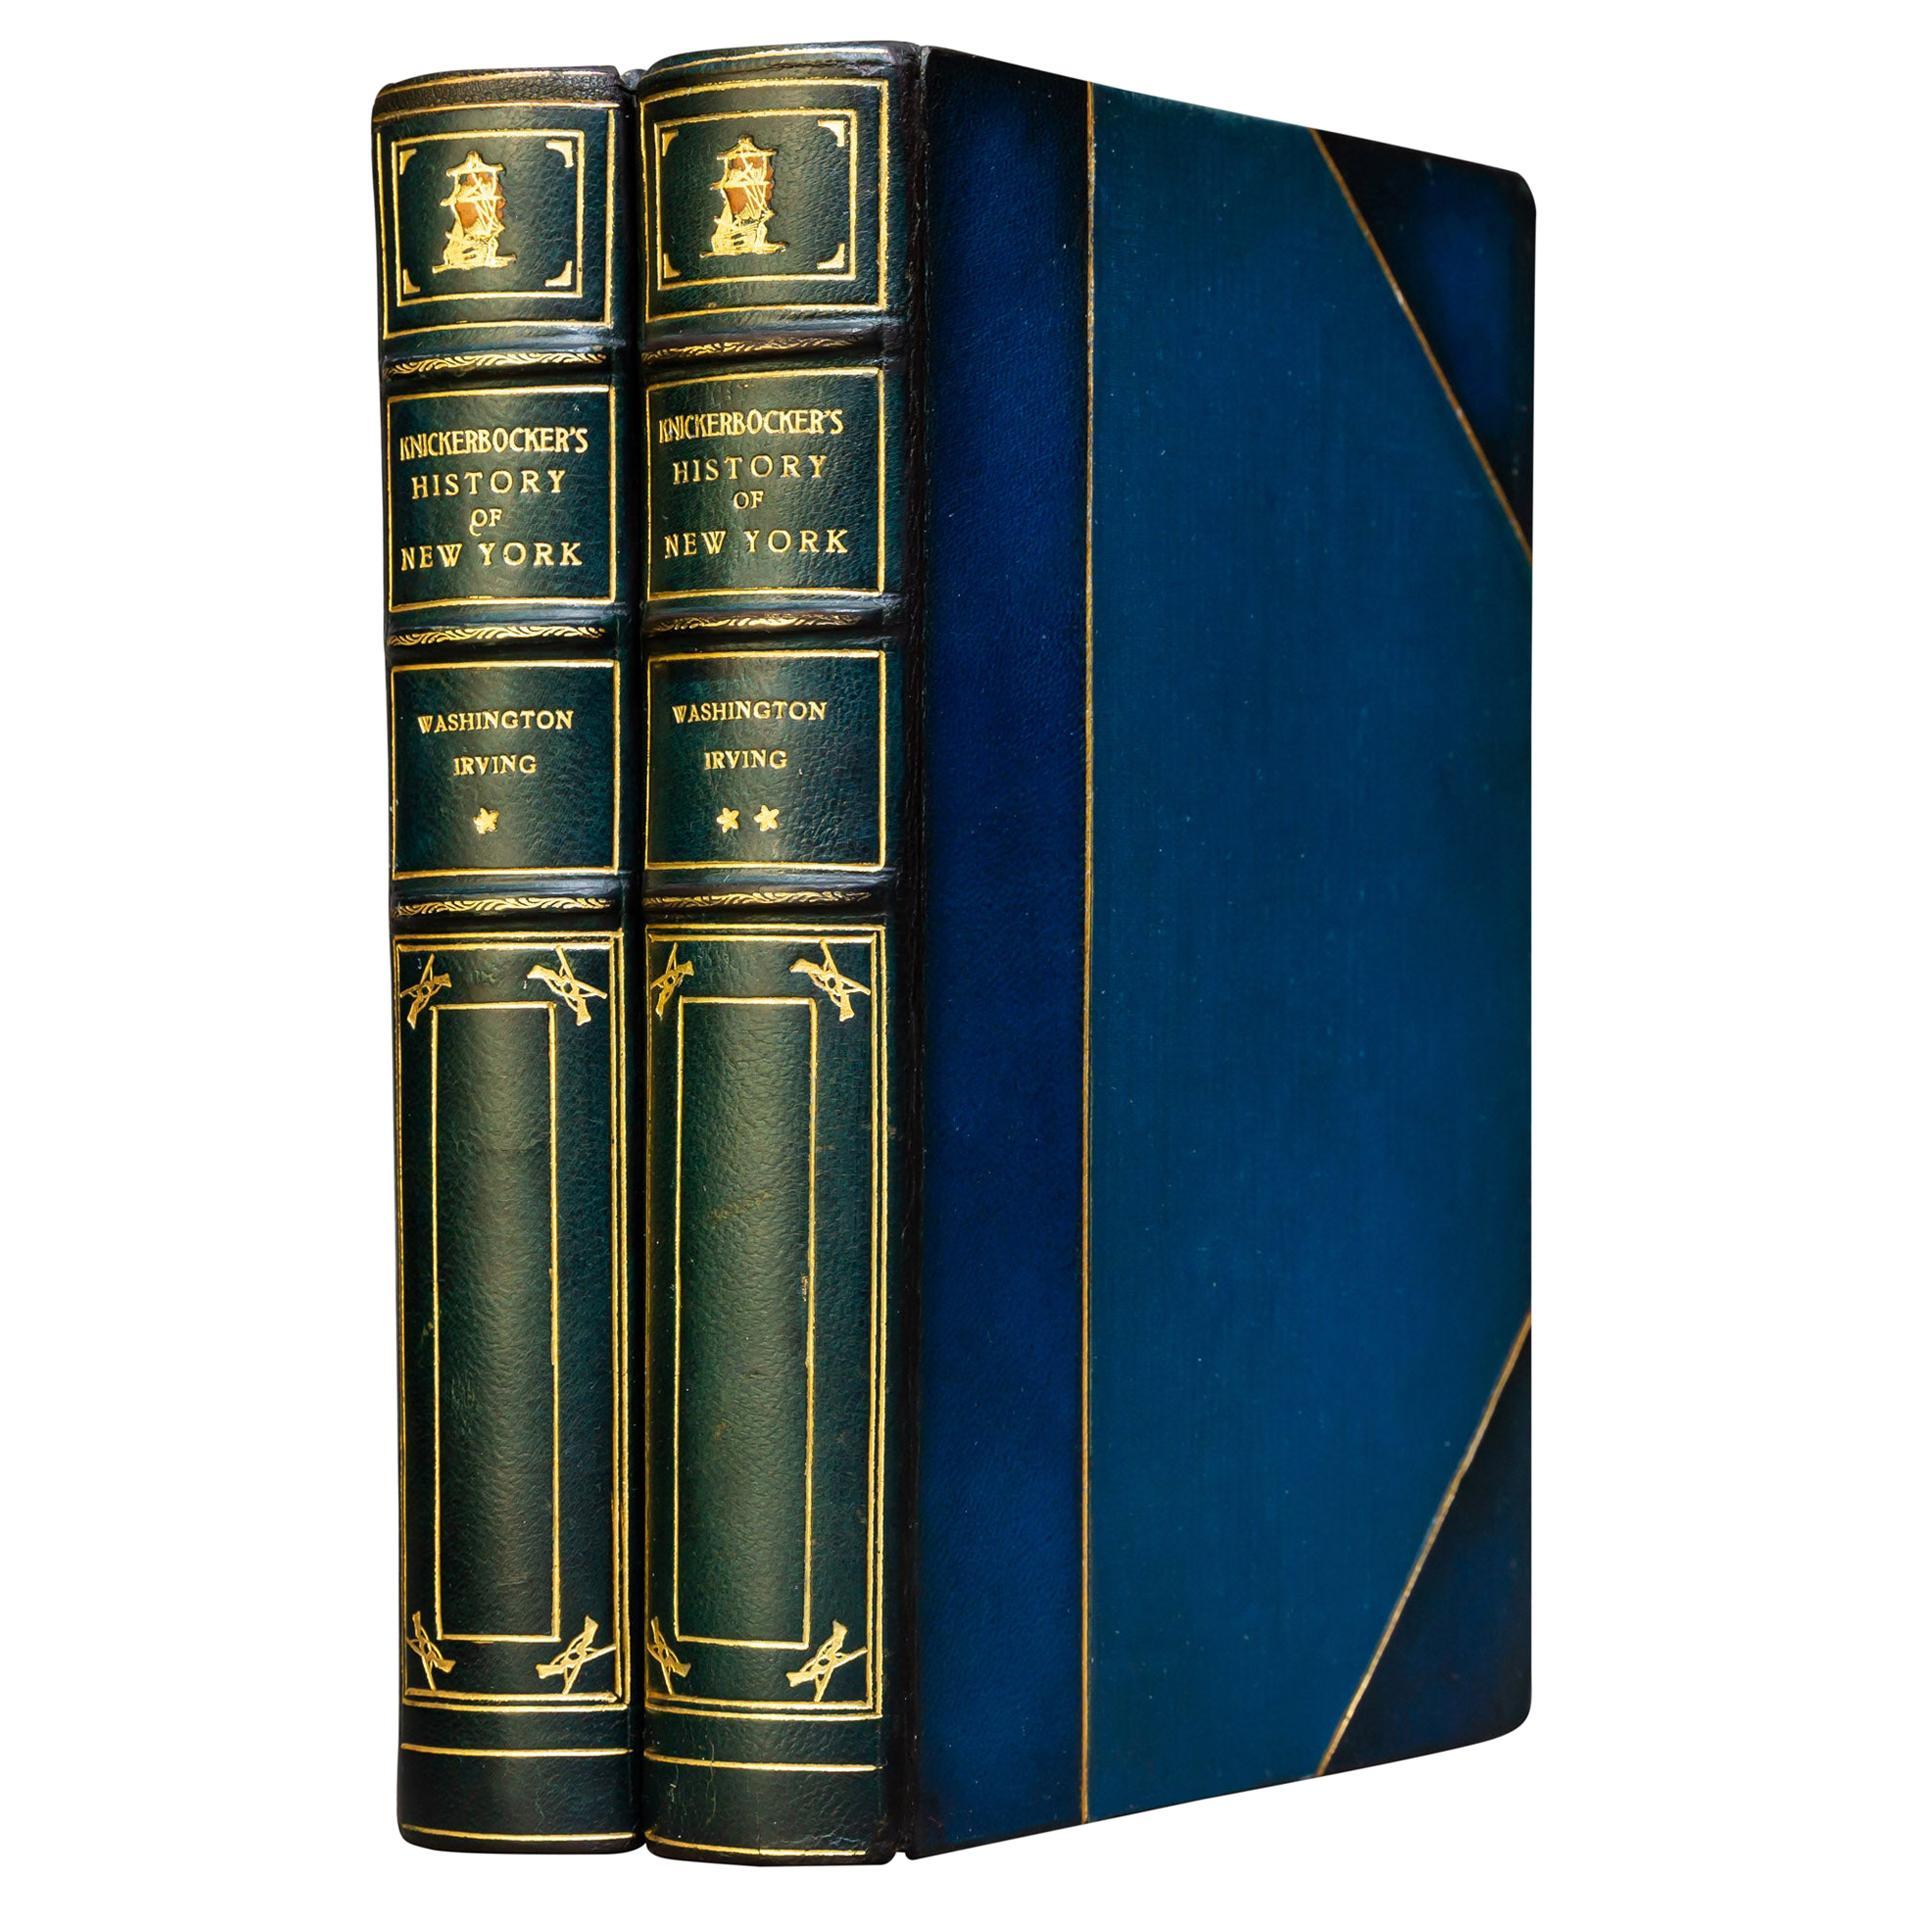 """Washington Irving, Knickerbocker's History of New York"" Book"